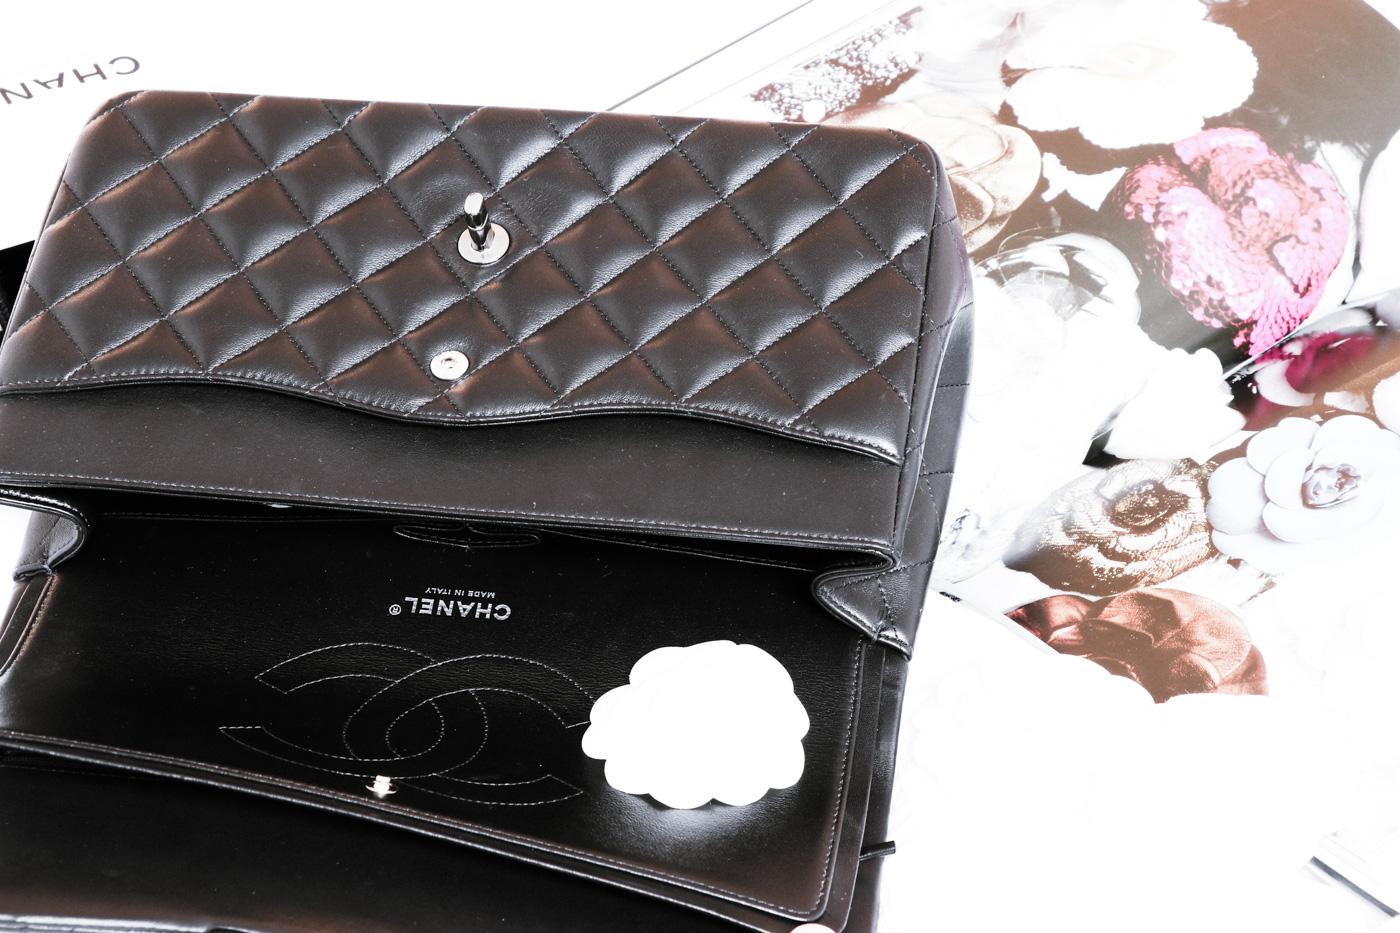 Chanel Flap 2.55